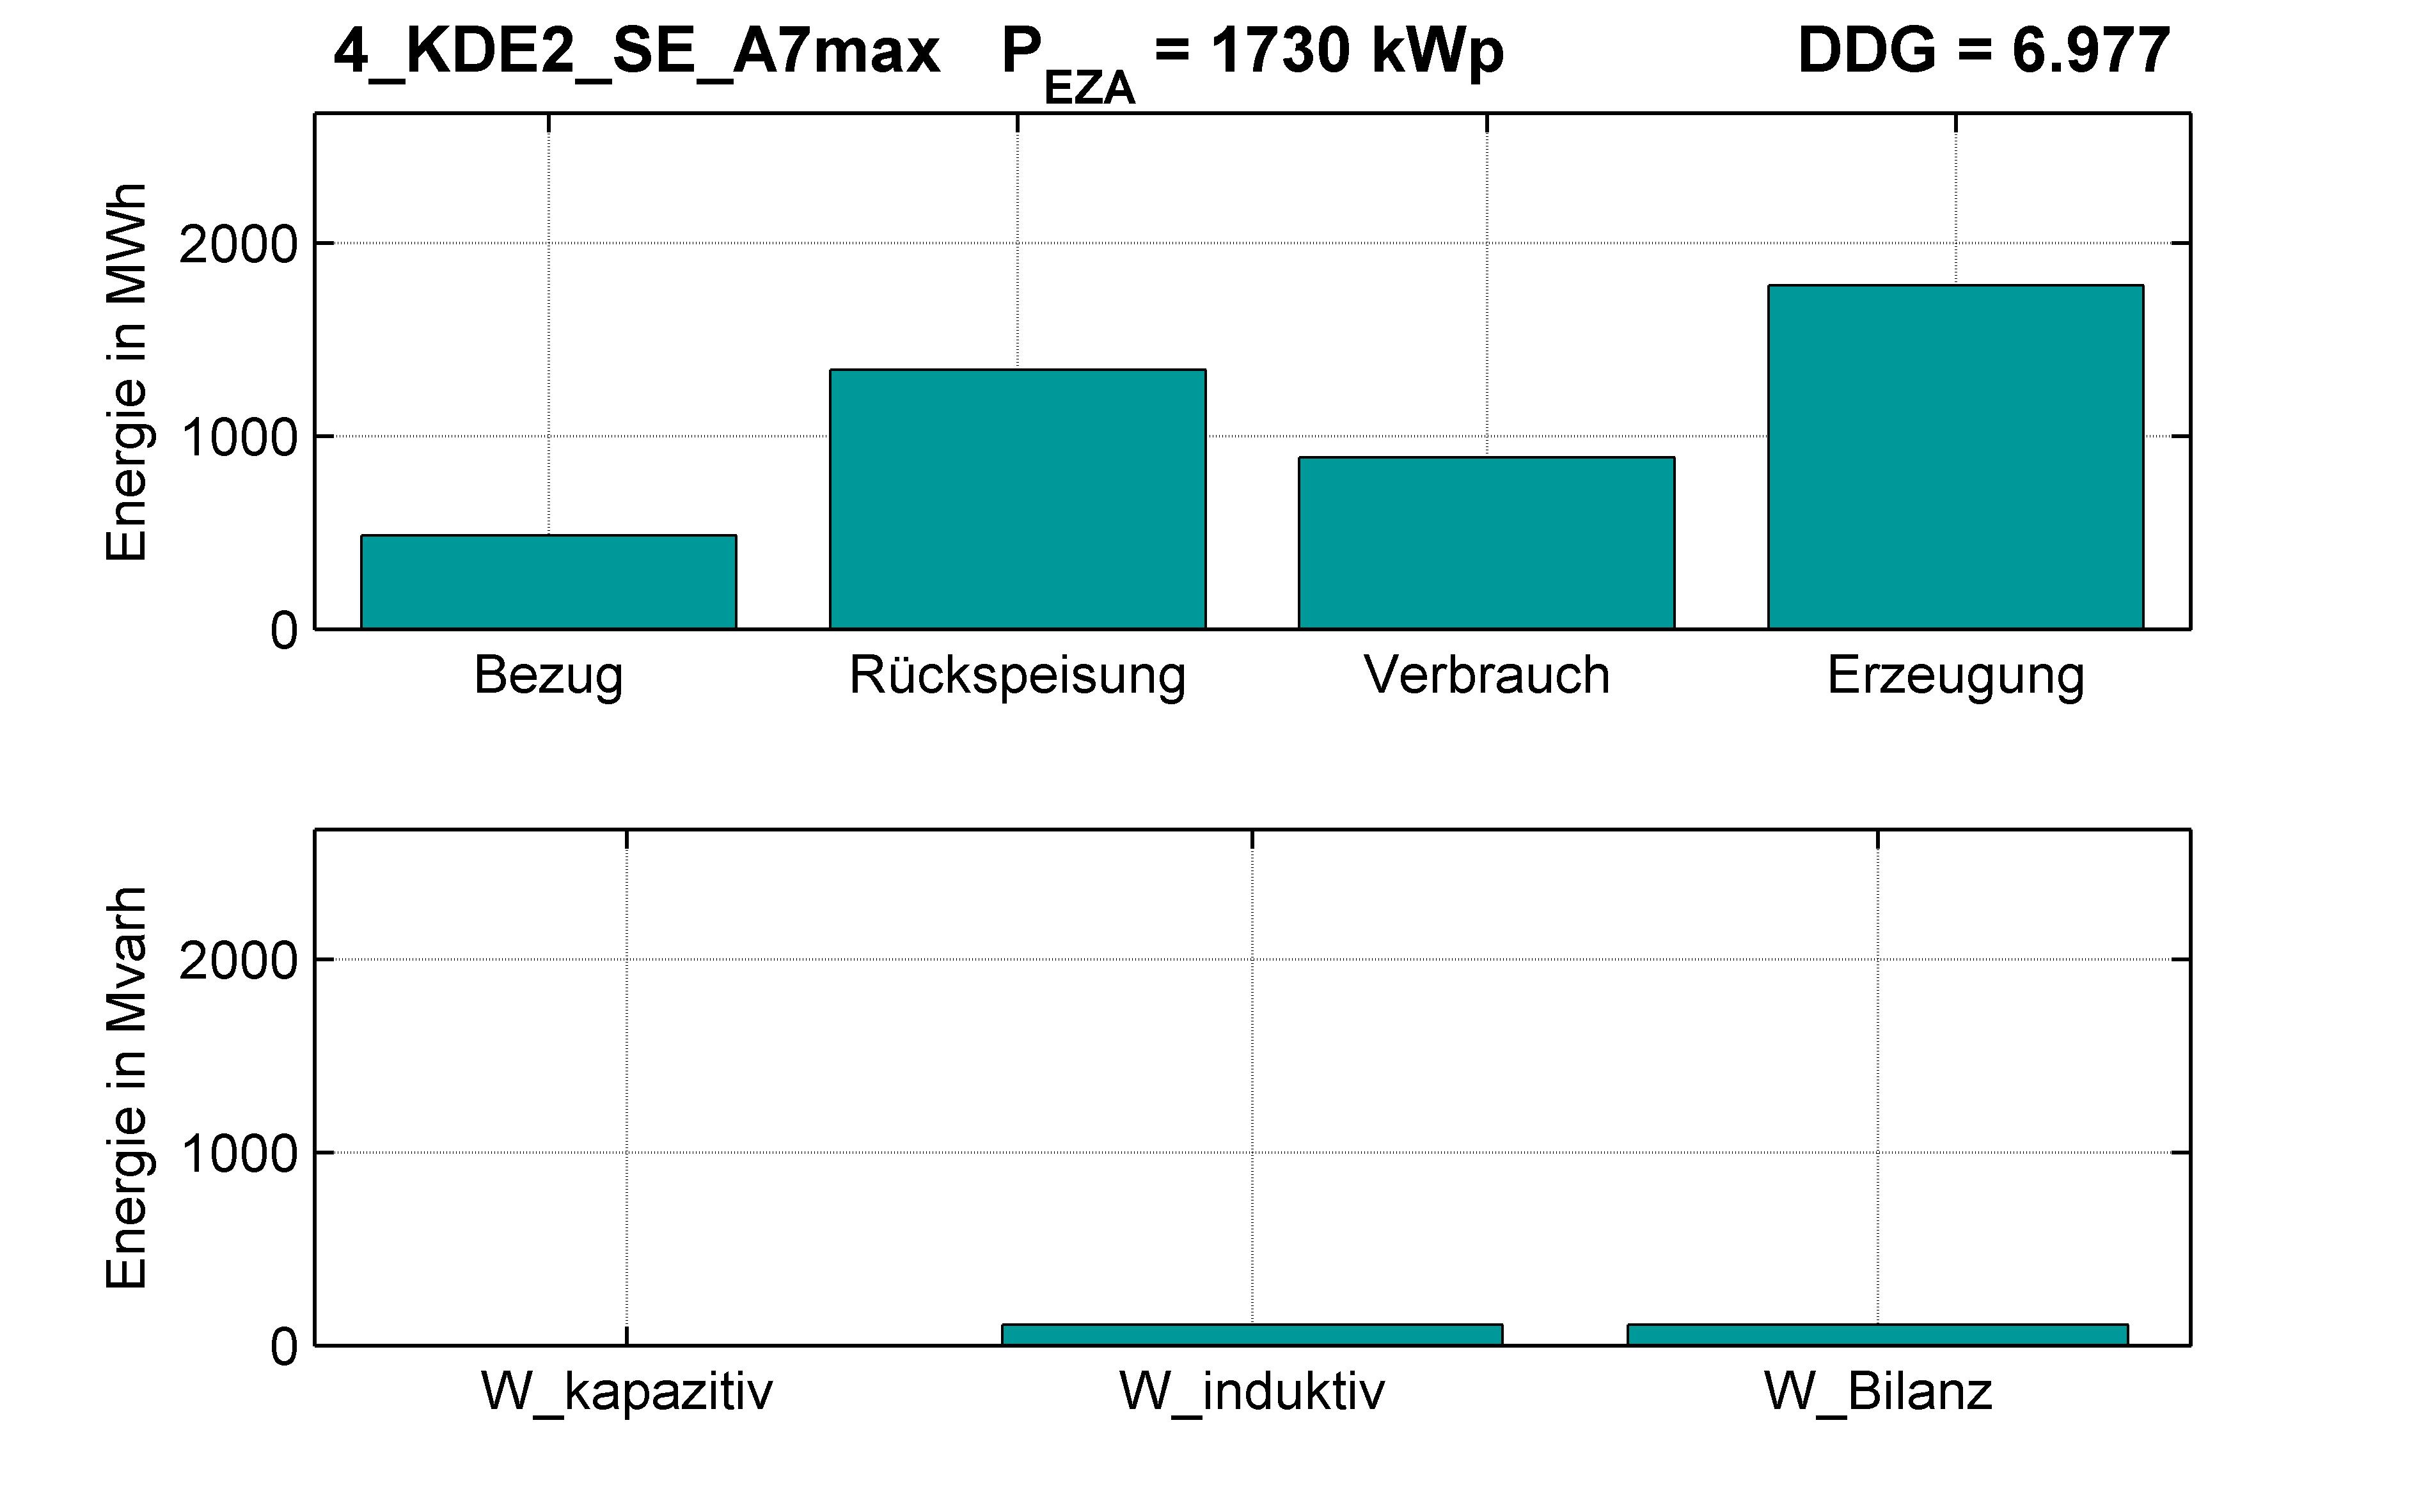 KDE2 | P-Kappung 55% (SE) A7max | PQ-Bilanz